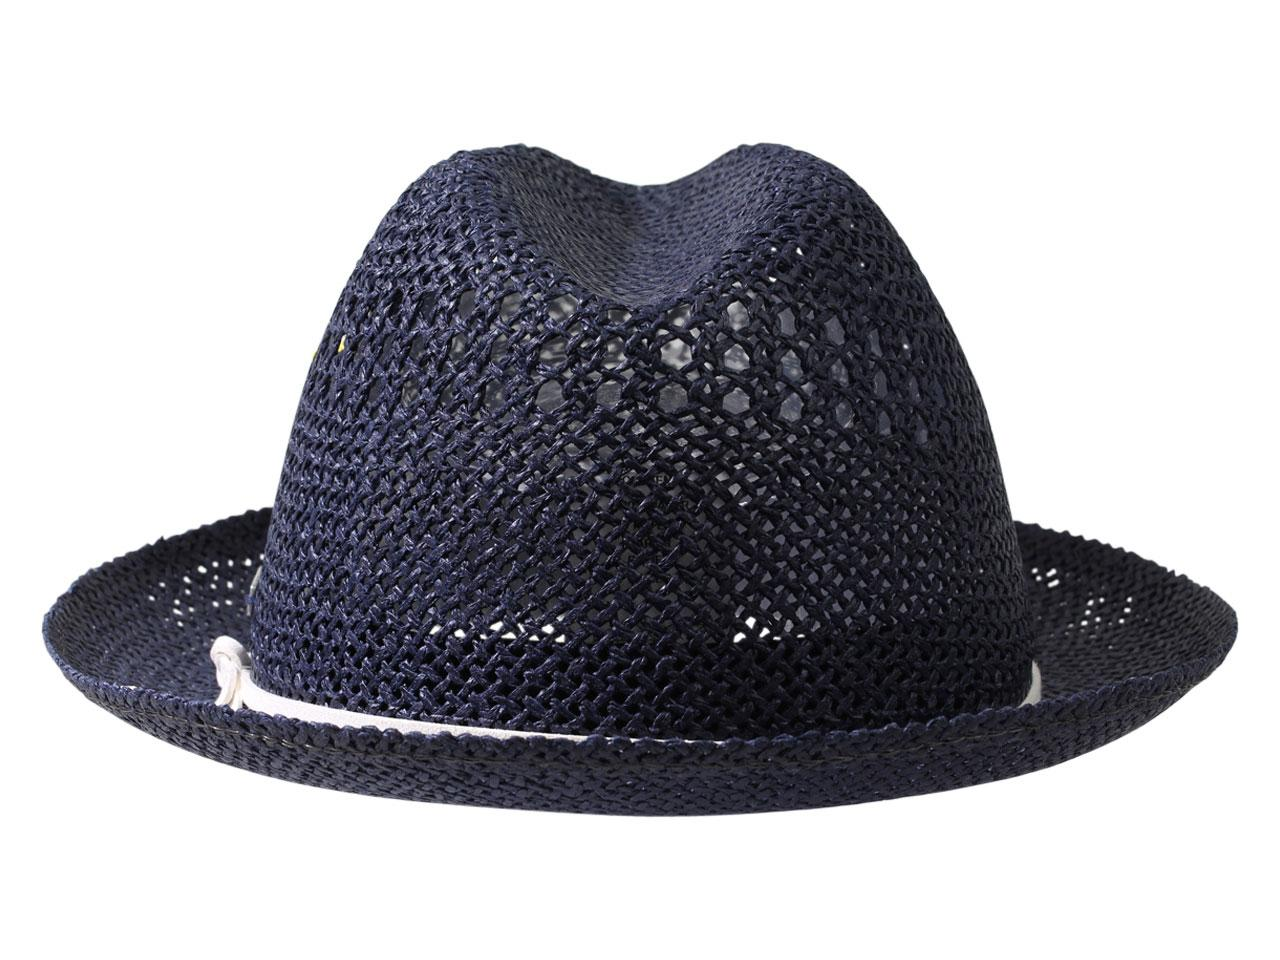 48437822ffe Kangol Men's Vented Straw Player Trilby Hat by Kangol. 123